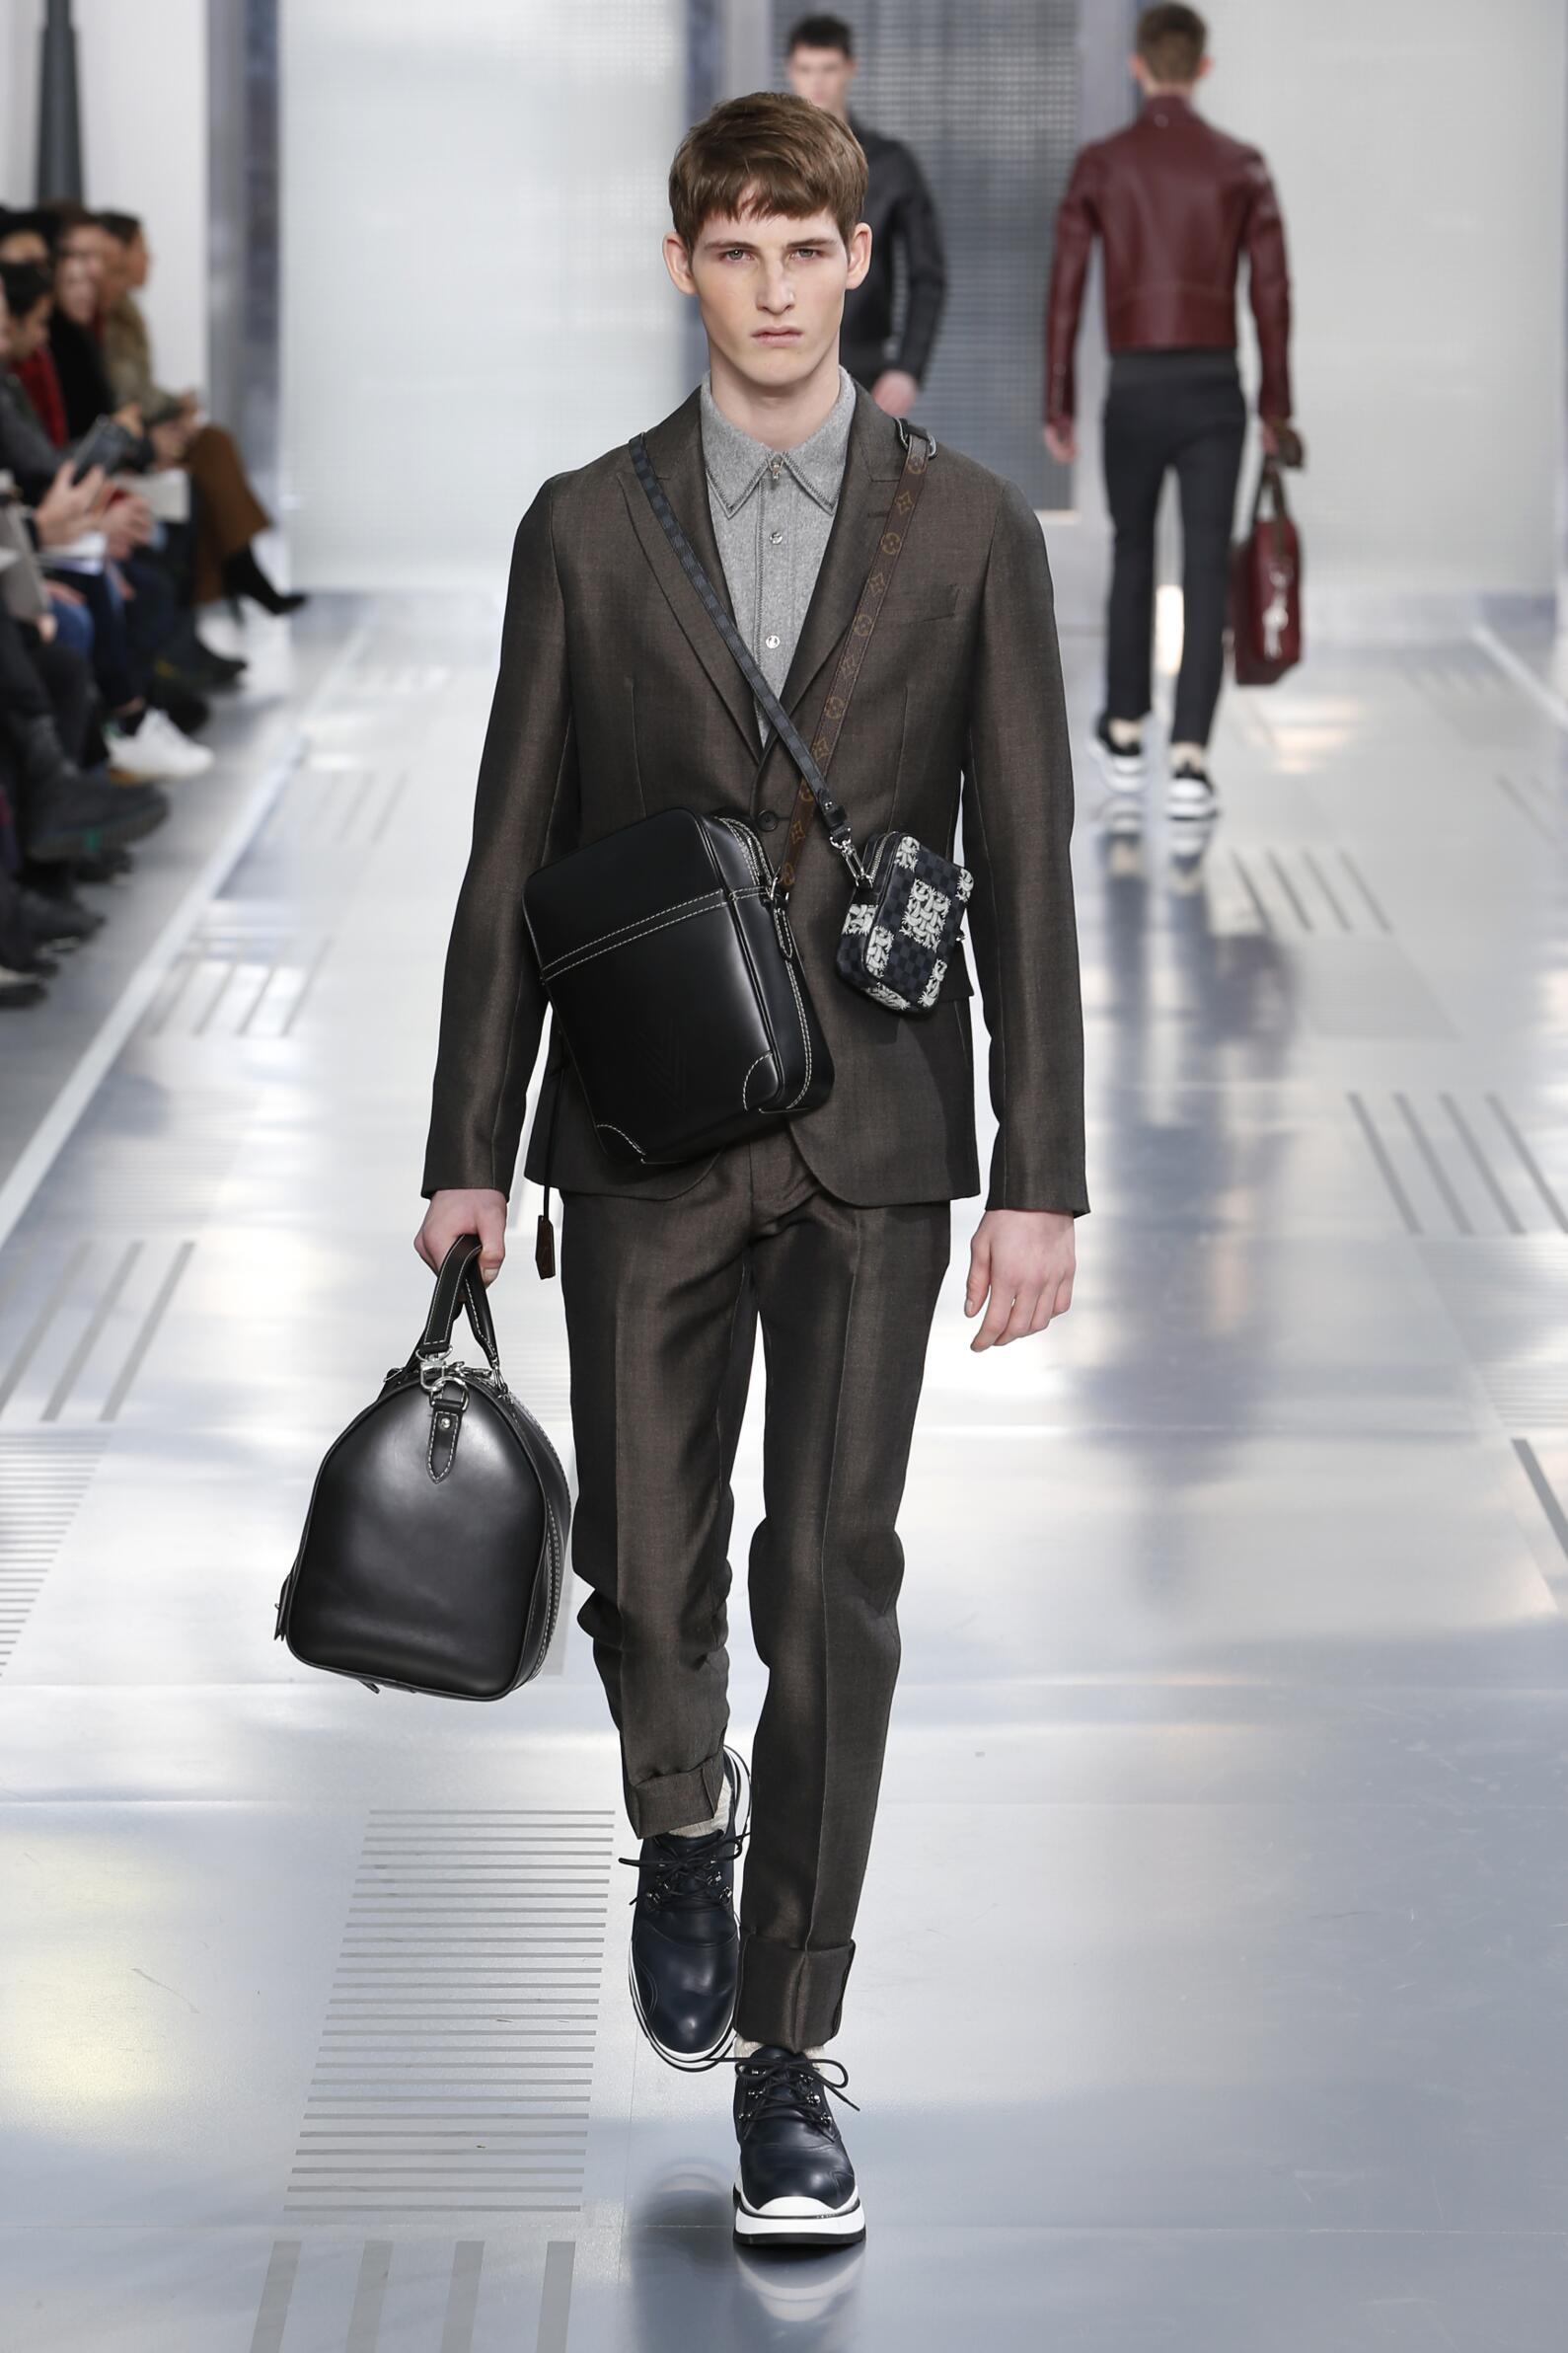 Louis Vuitton Collection Man Paris Fashion Week